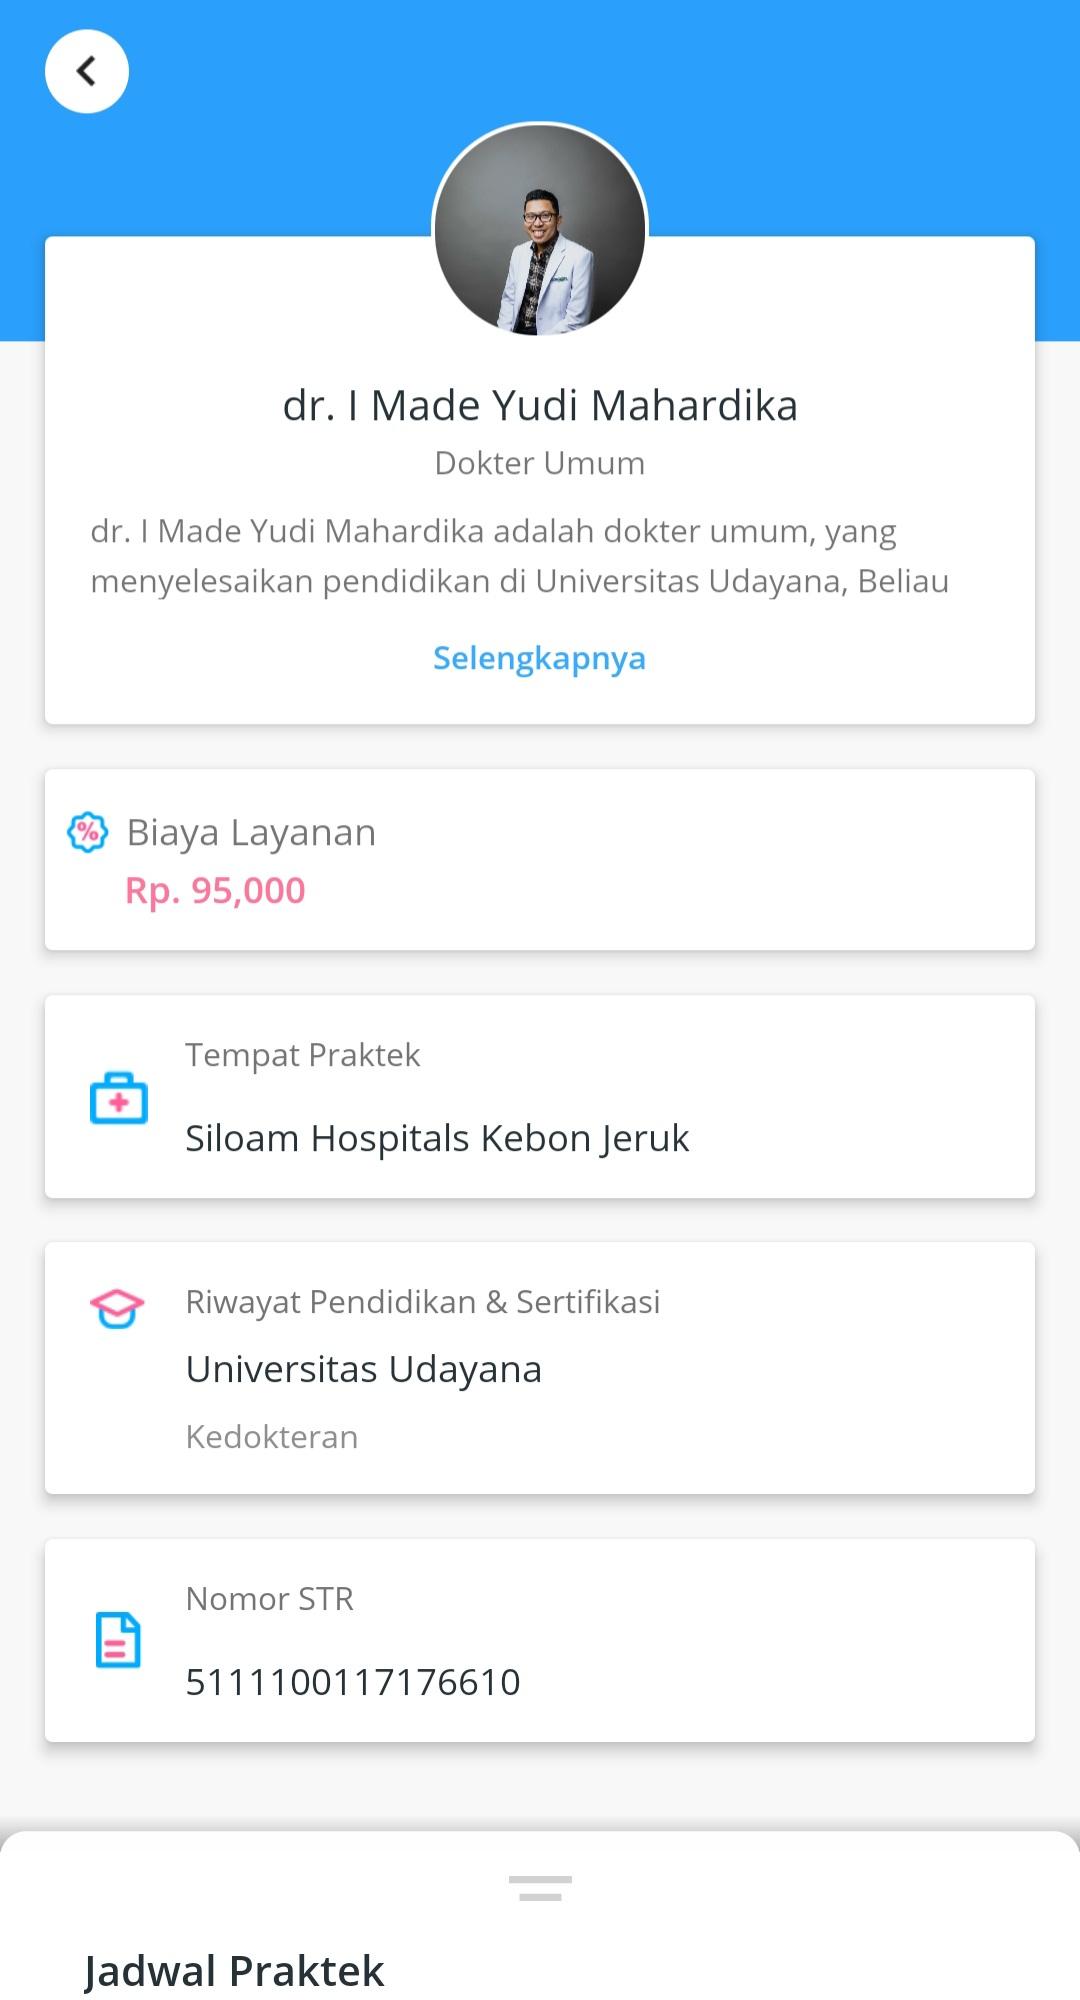 Profil tenaga medis